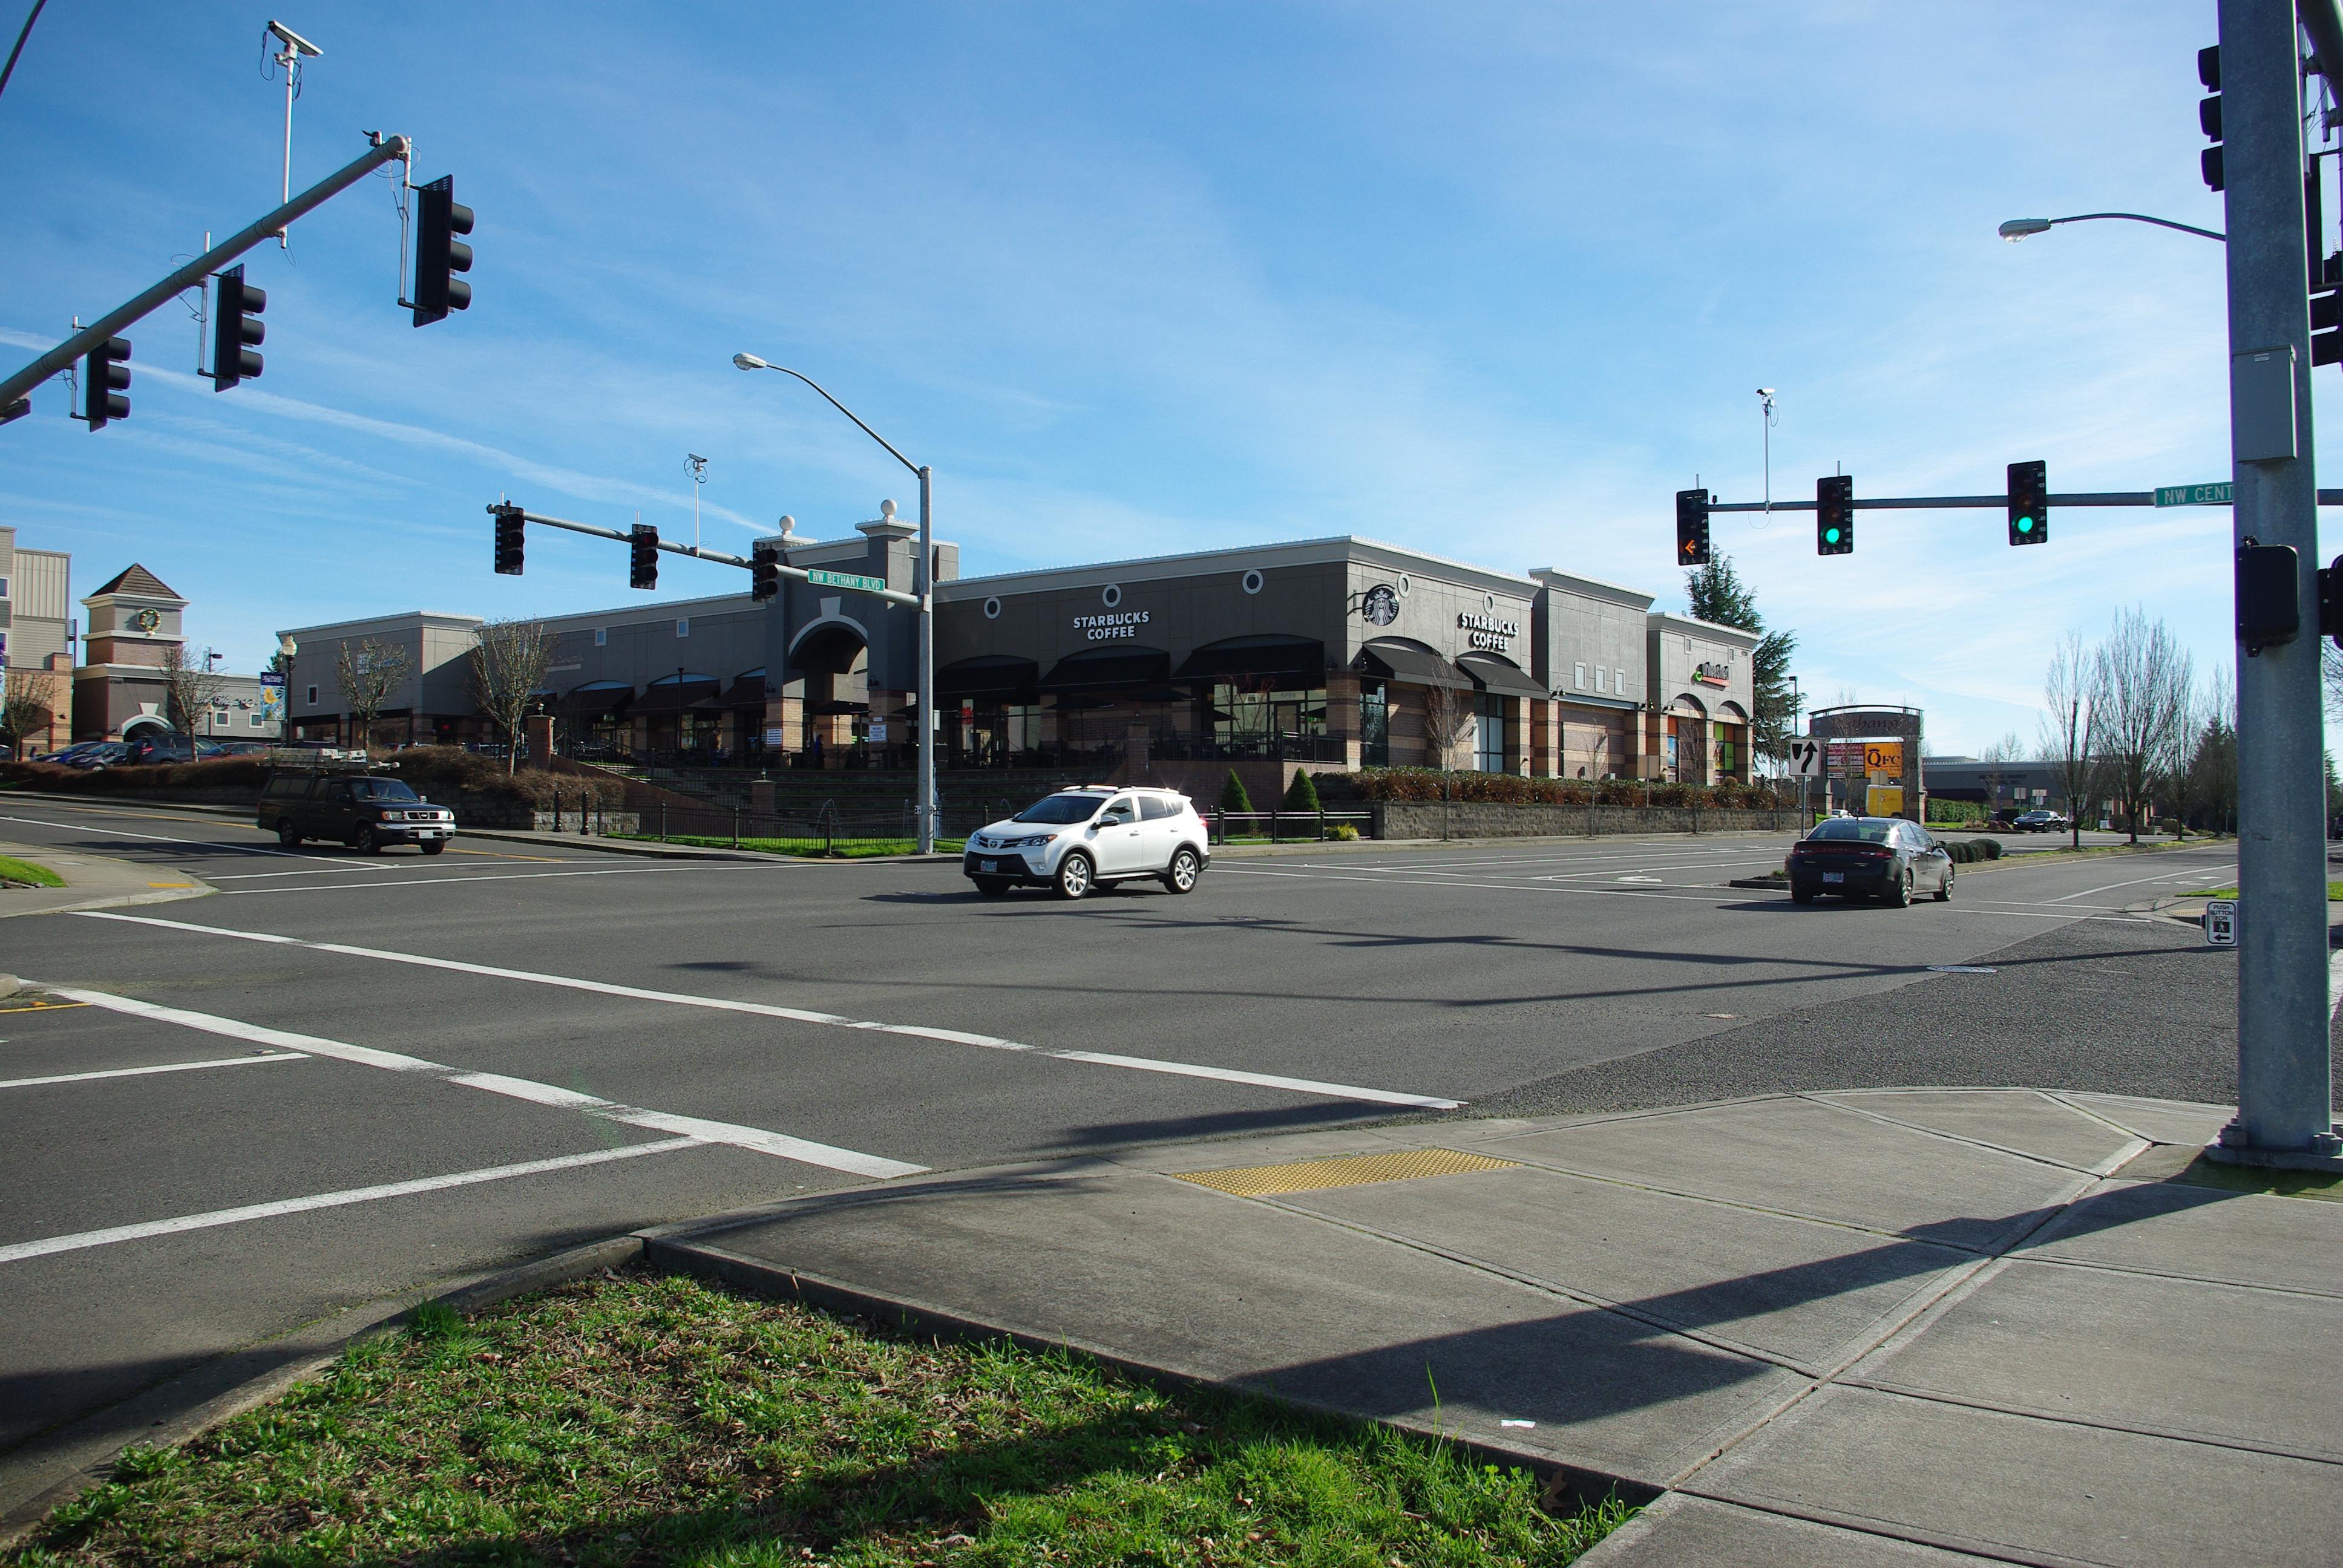 File:Starbucks at Bethany - Oregon.JPG - Wikimedia Commons